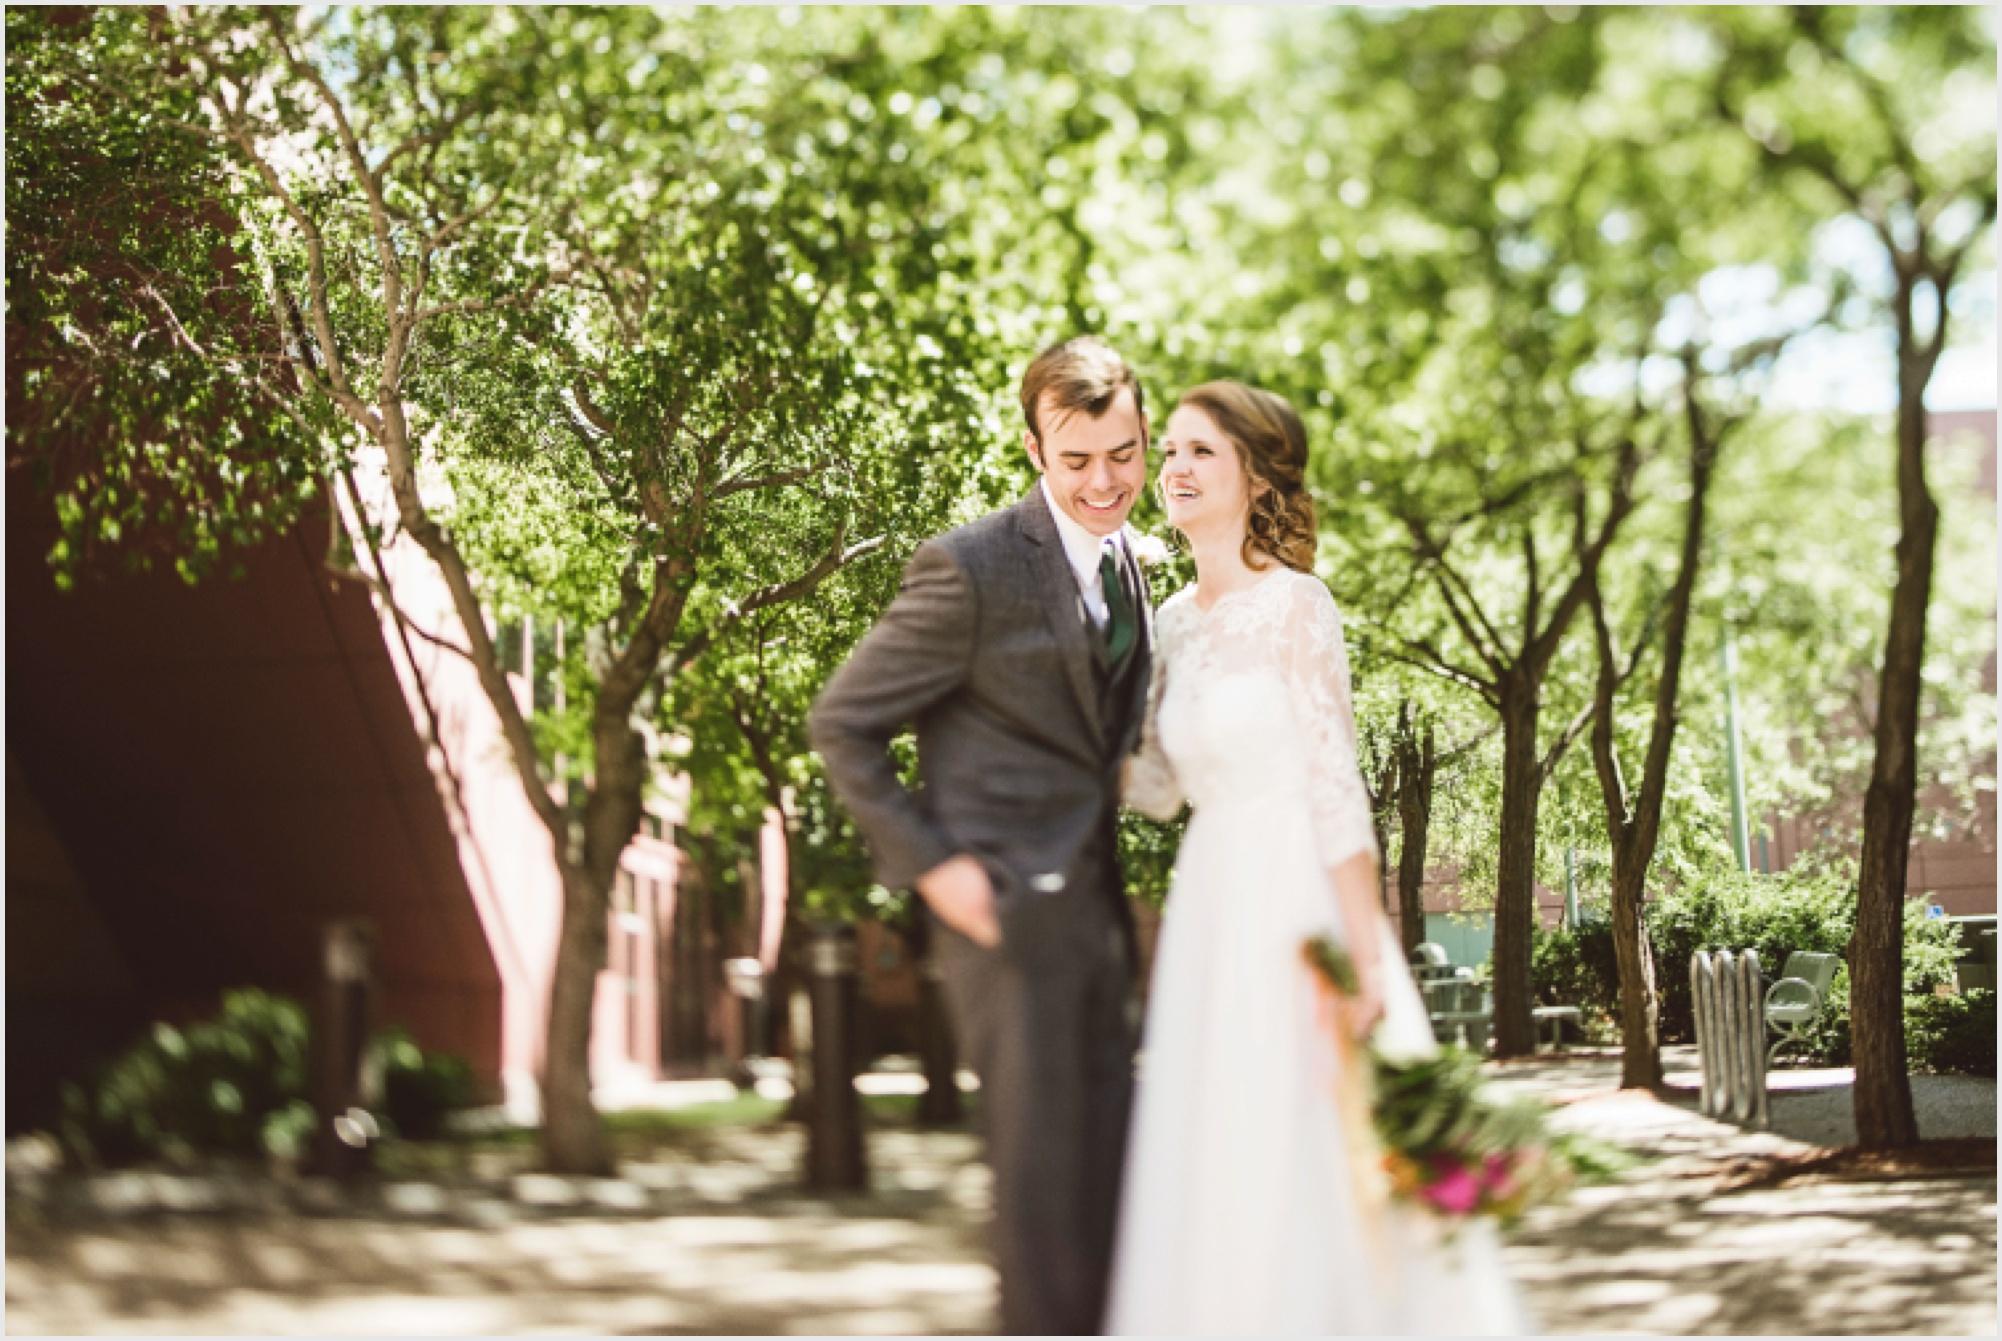 abby_taylor_minneapolis_wedding_lucas_botz_photography_145.jpg